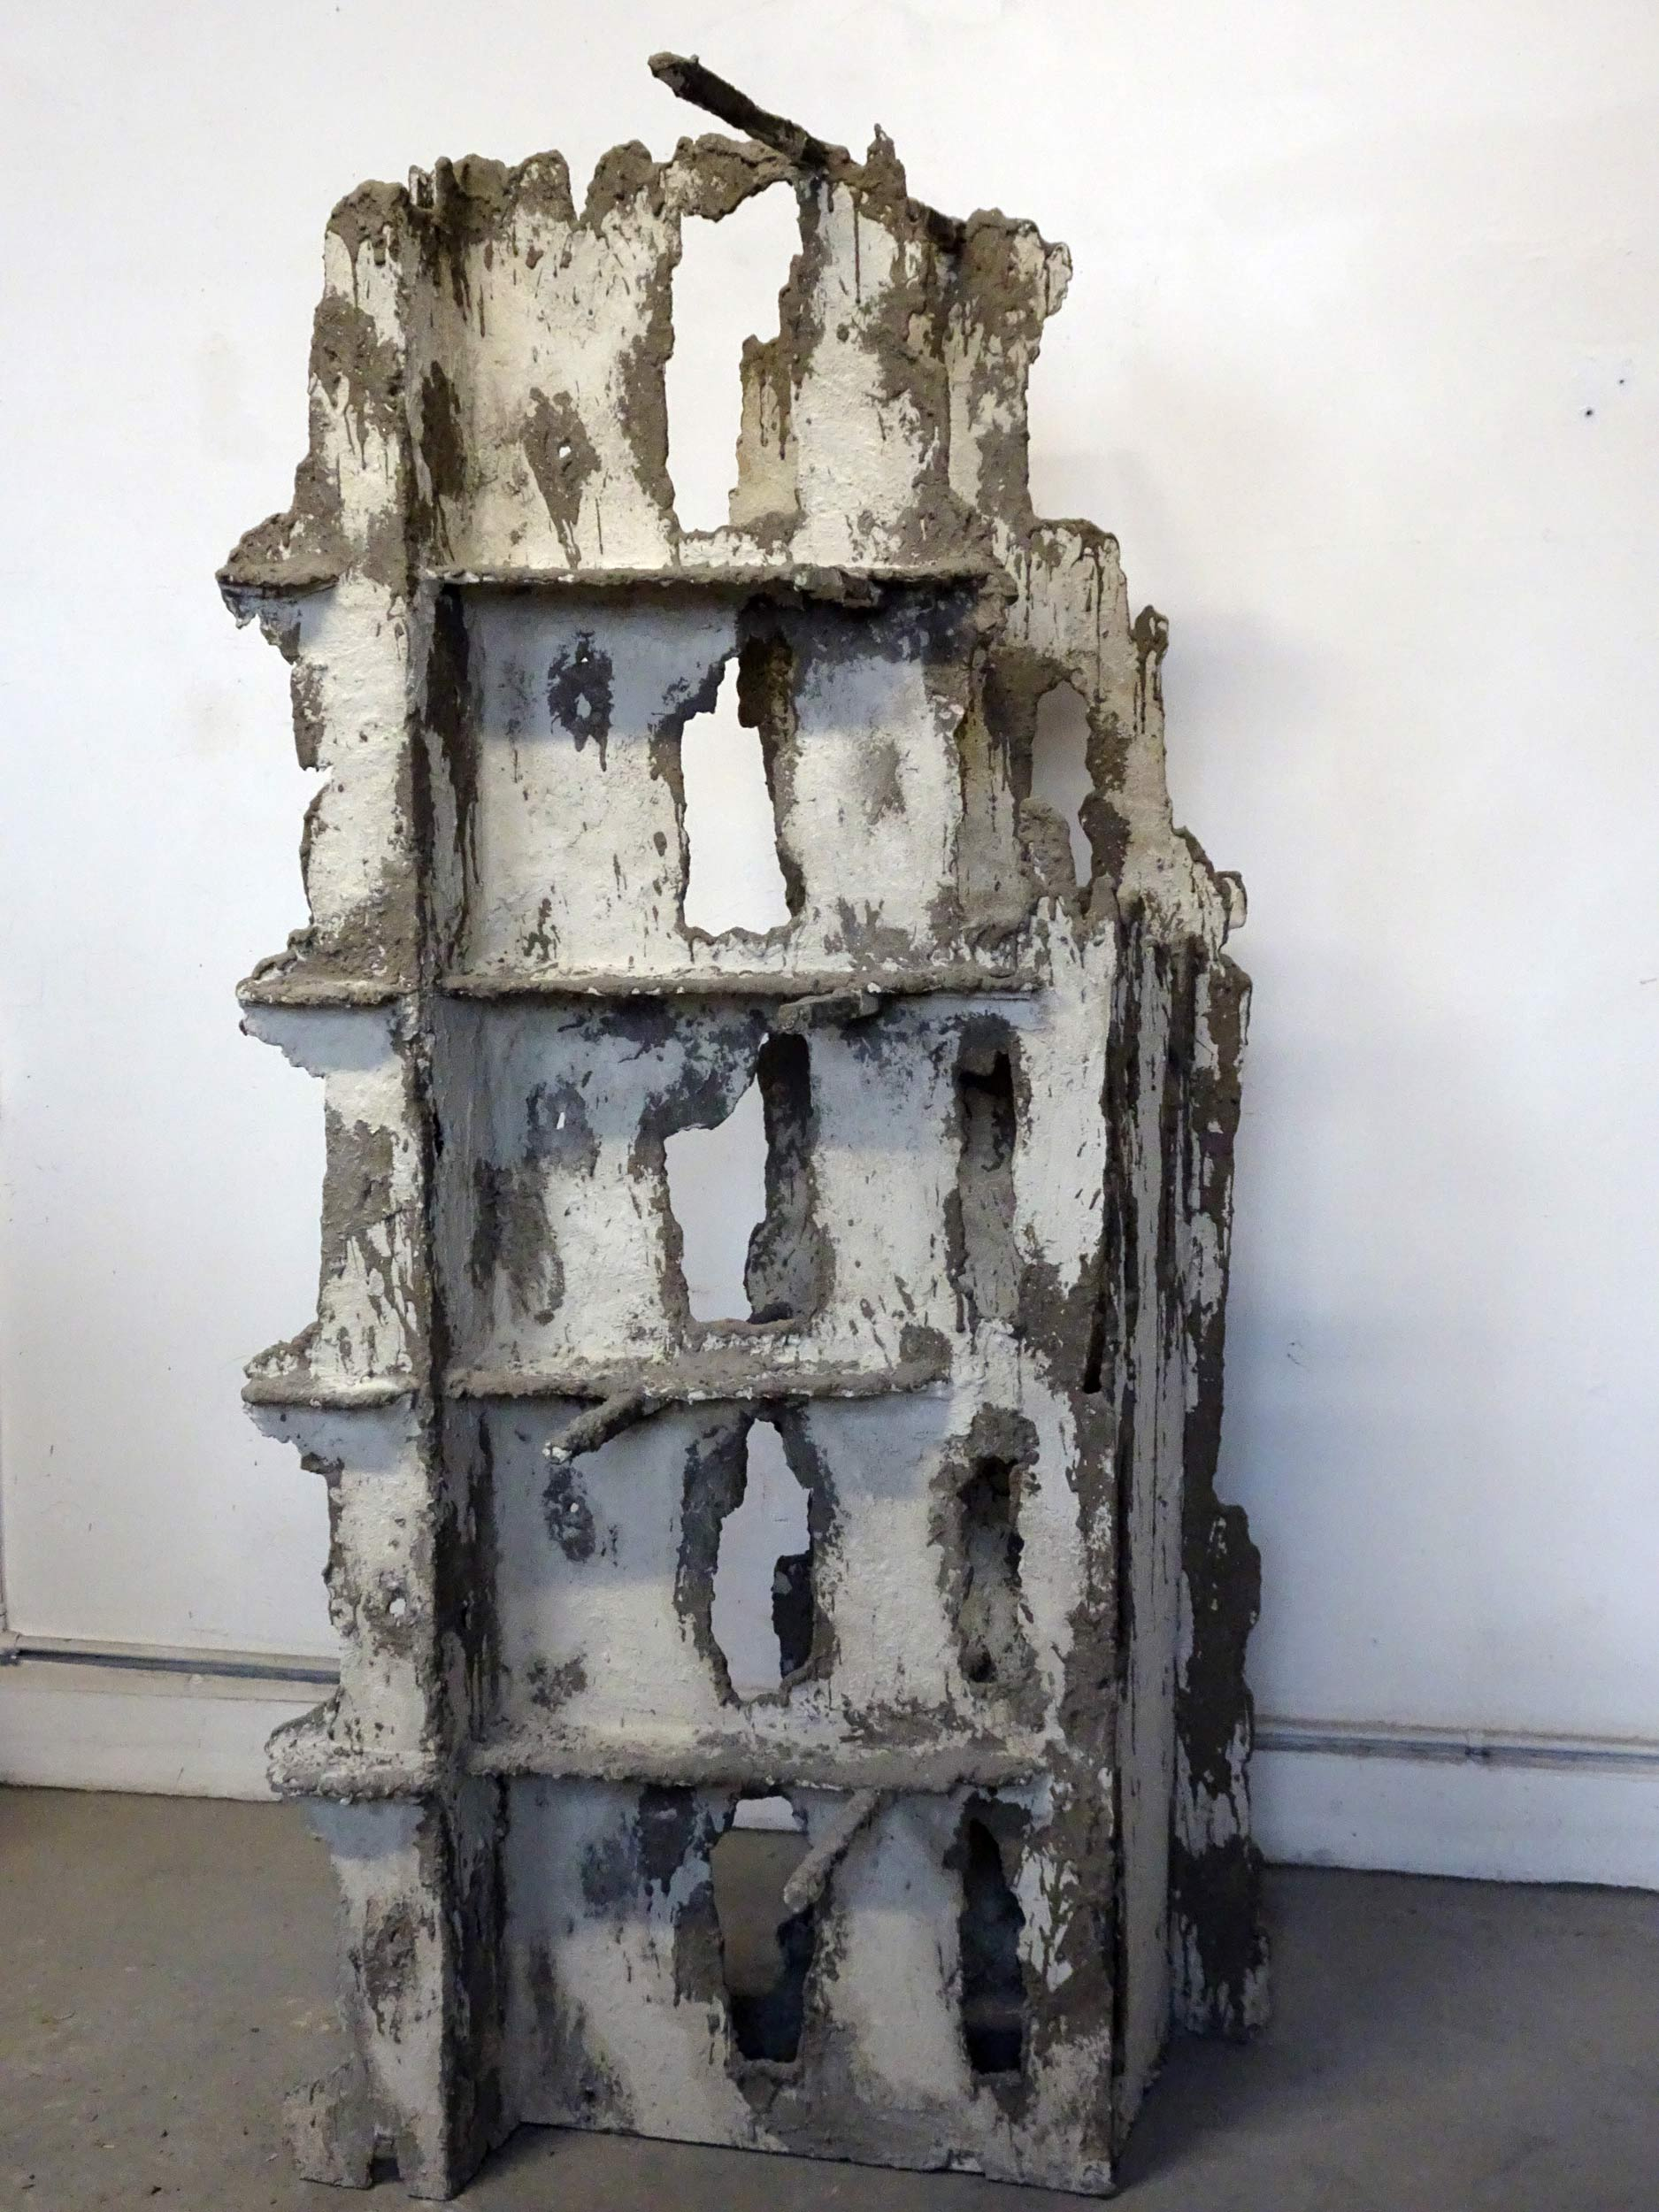 osip-sculpture_avenida-de-la-perfidia.jpg